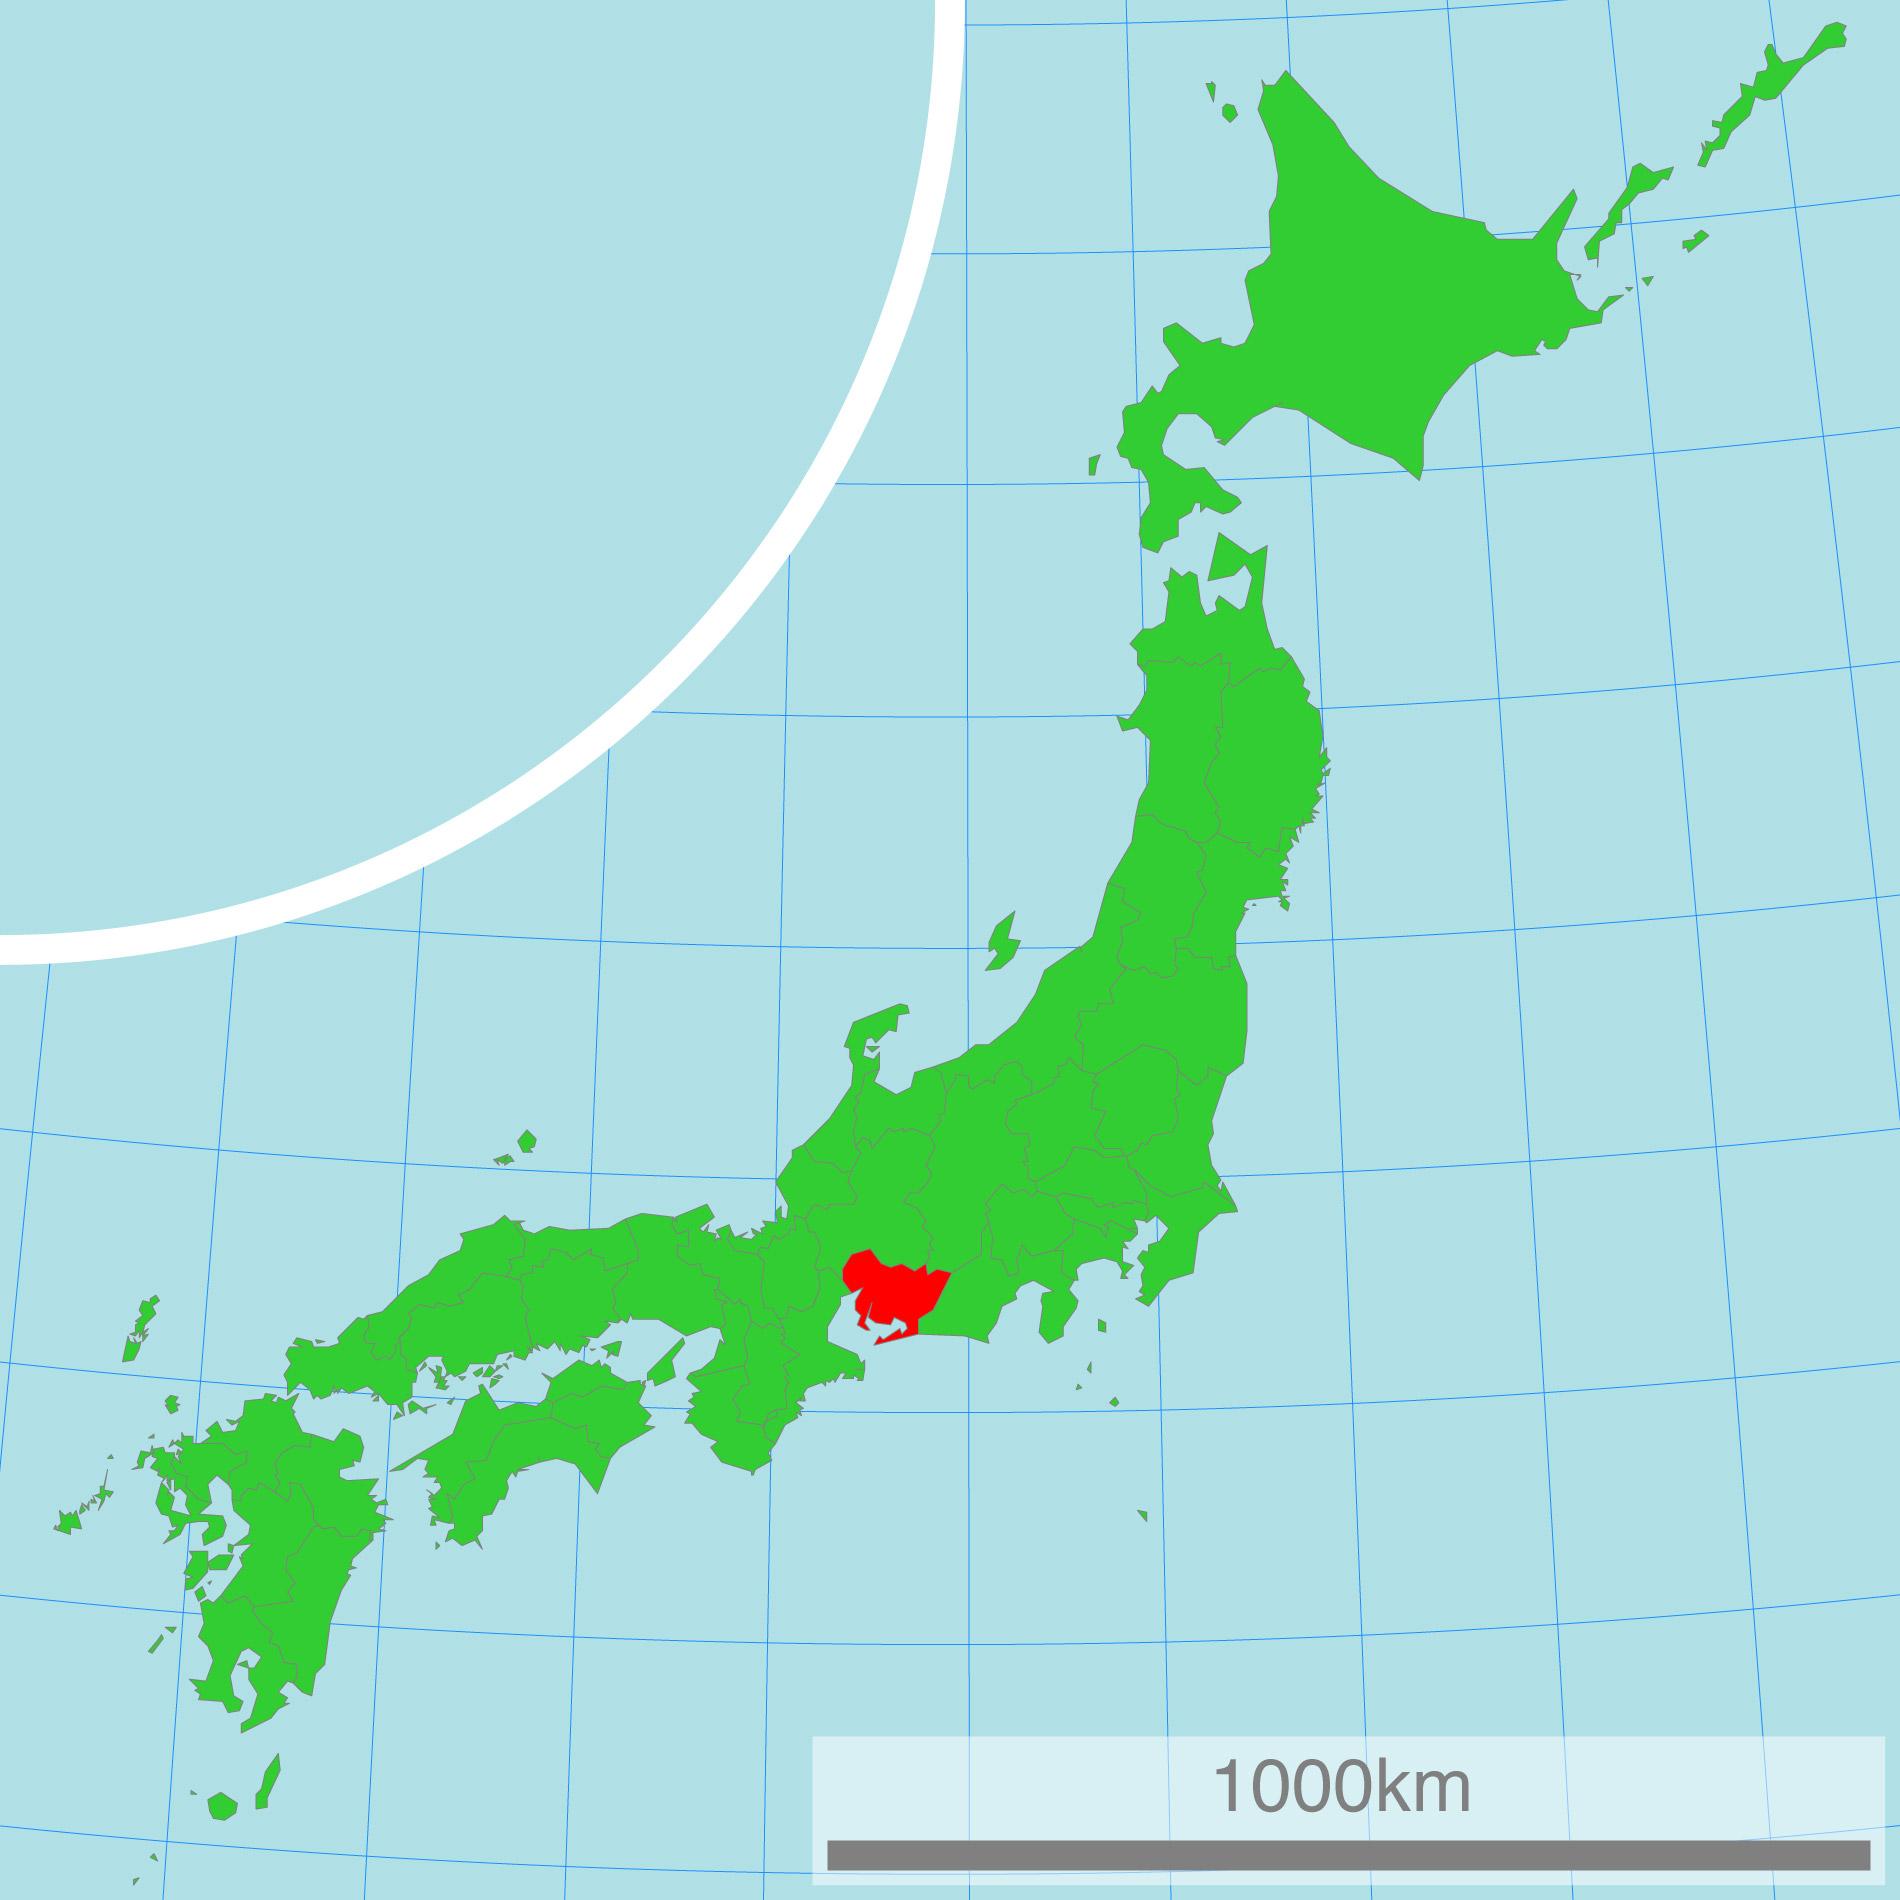 Japankarte: Die Präfektur Aichi.